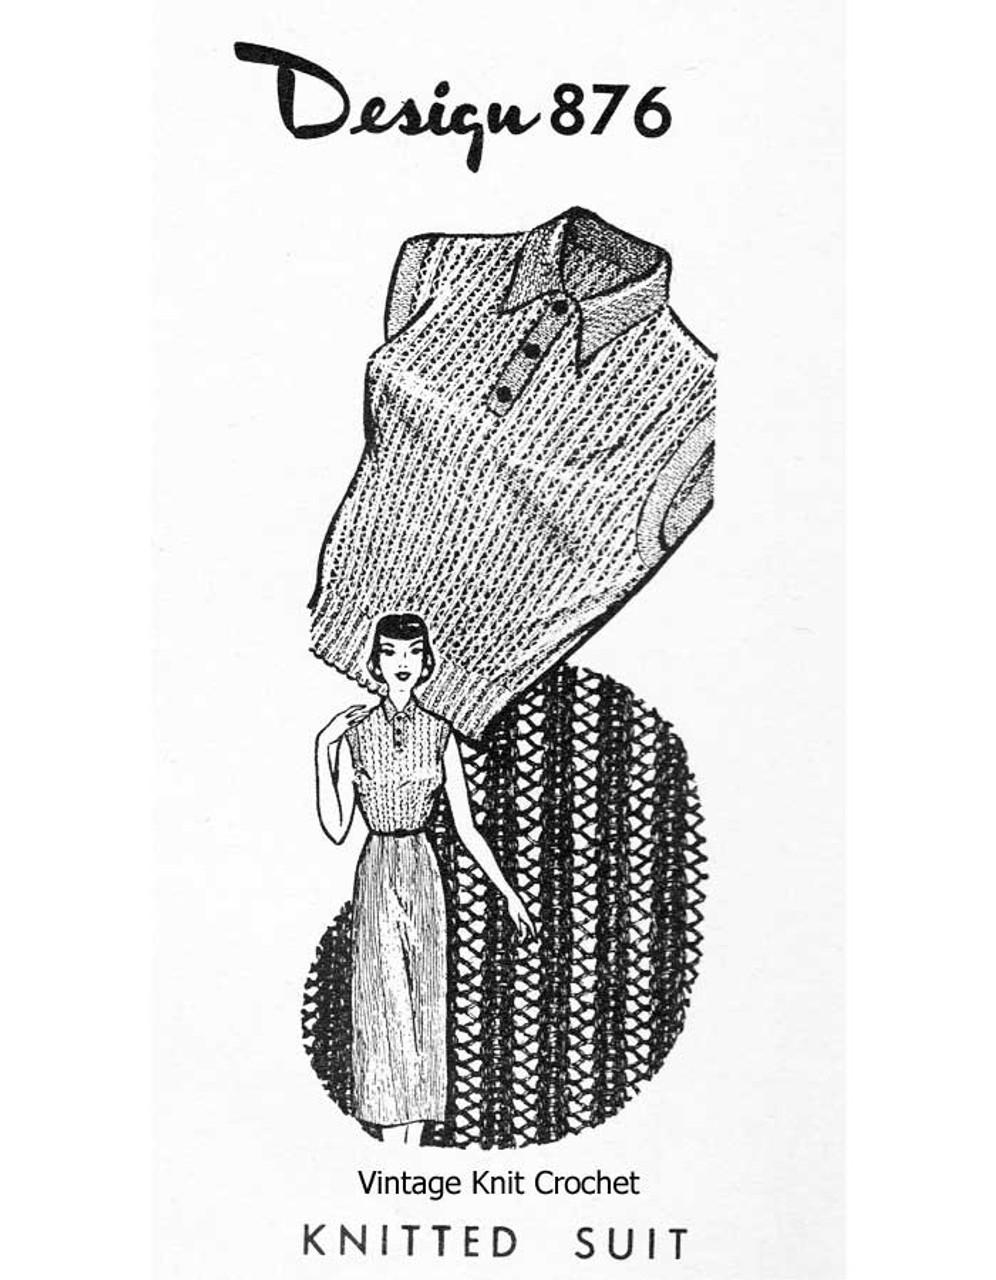 Easy Knit Dress Pattern, Laura Wheeler Design 876